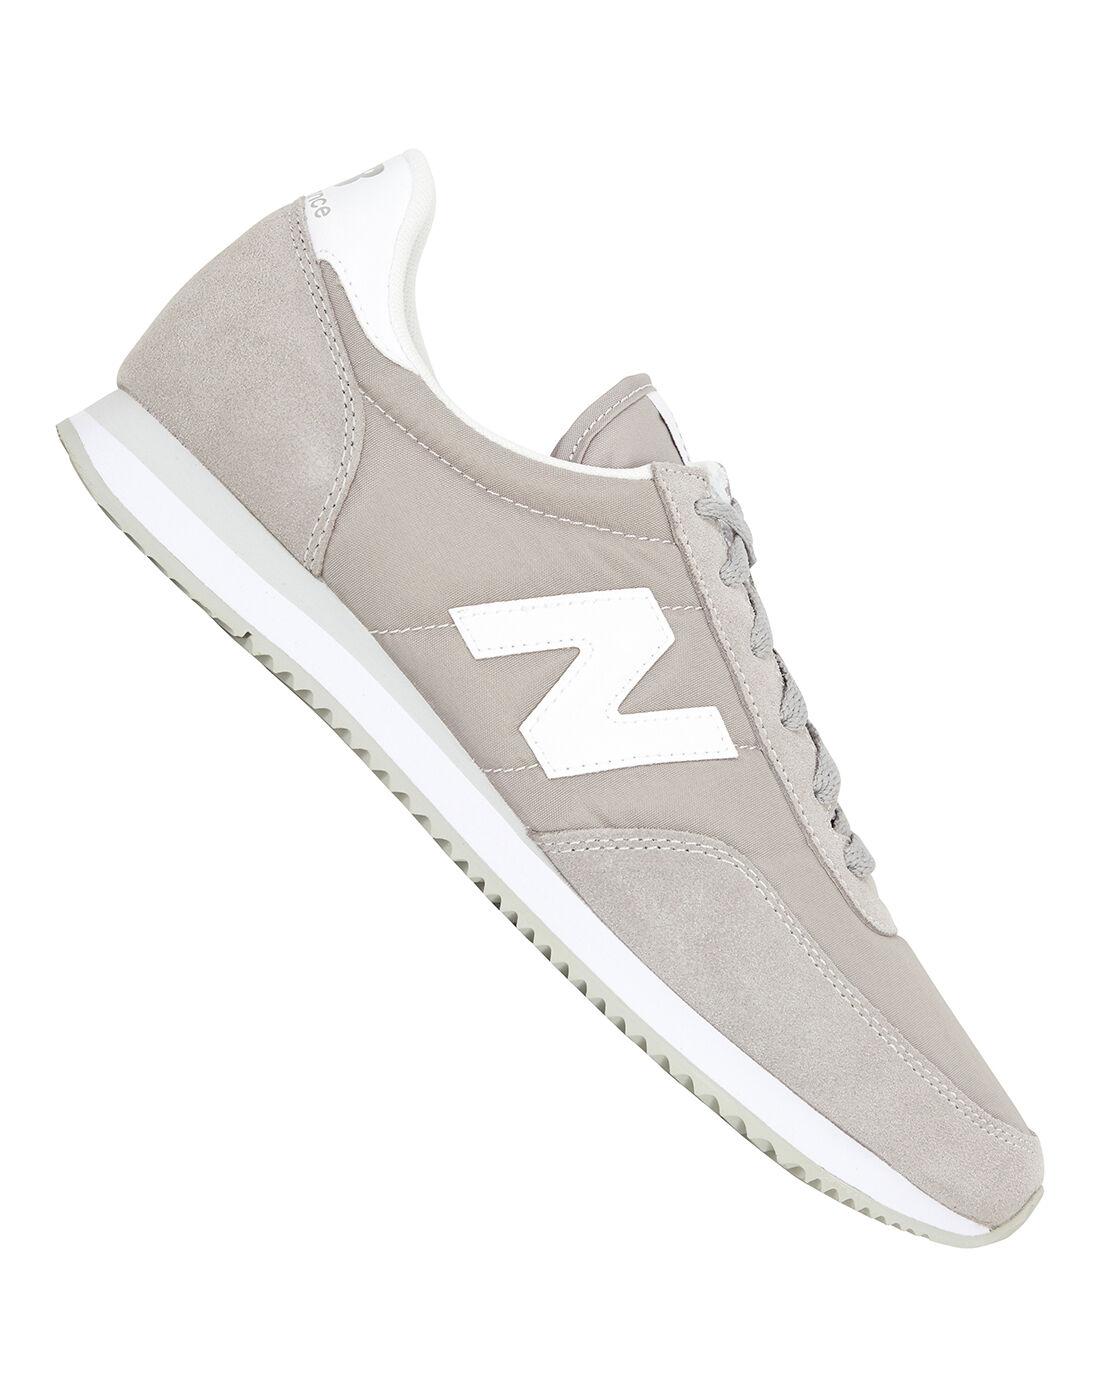 New Balance Mens 720 Trainers - Grey